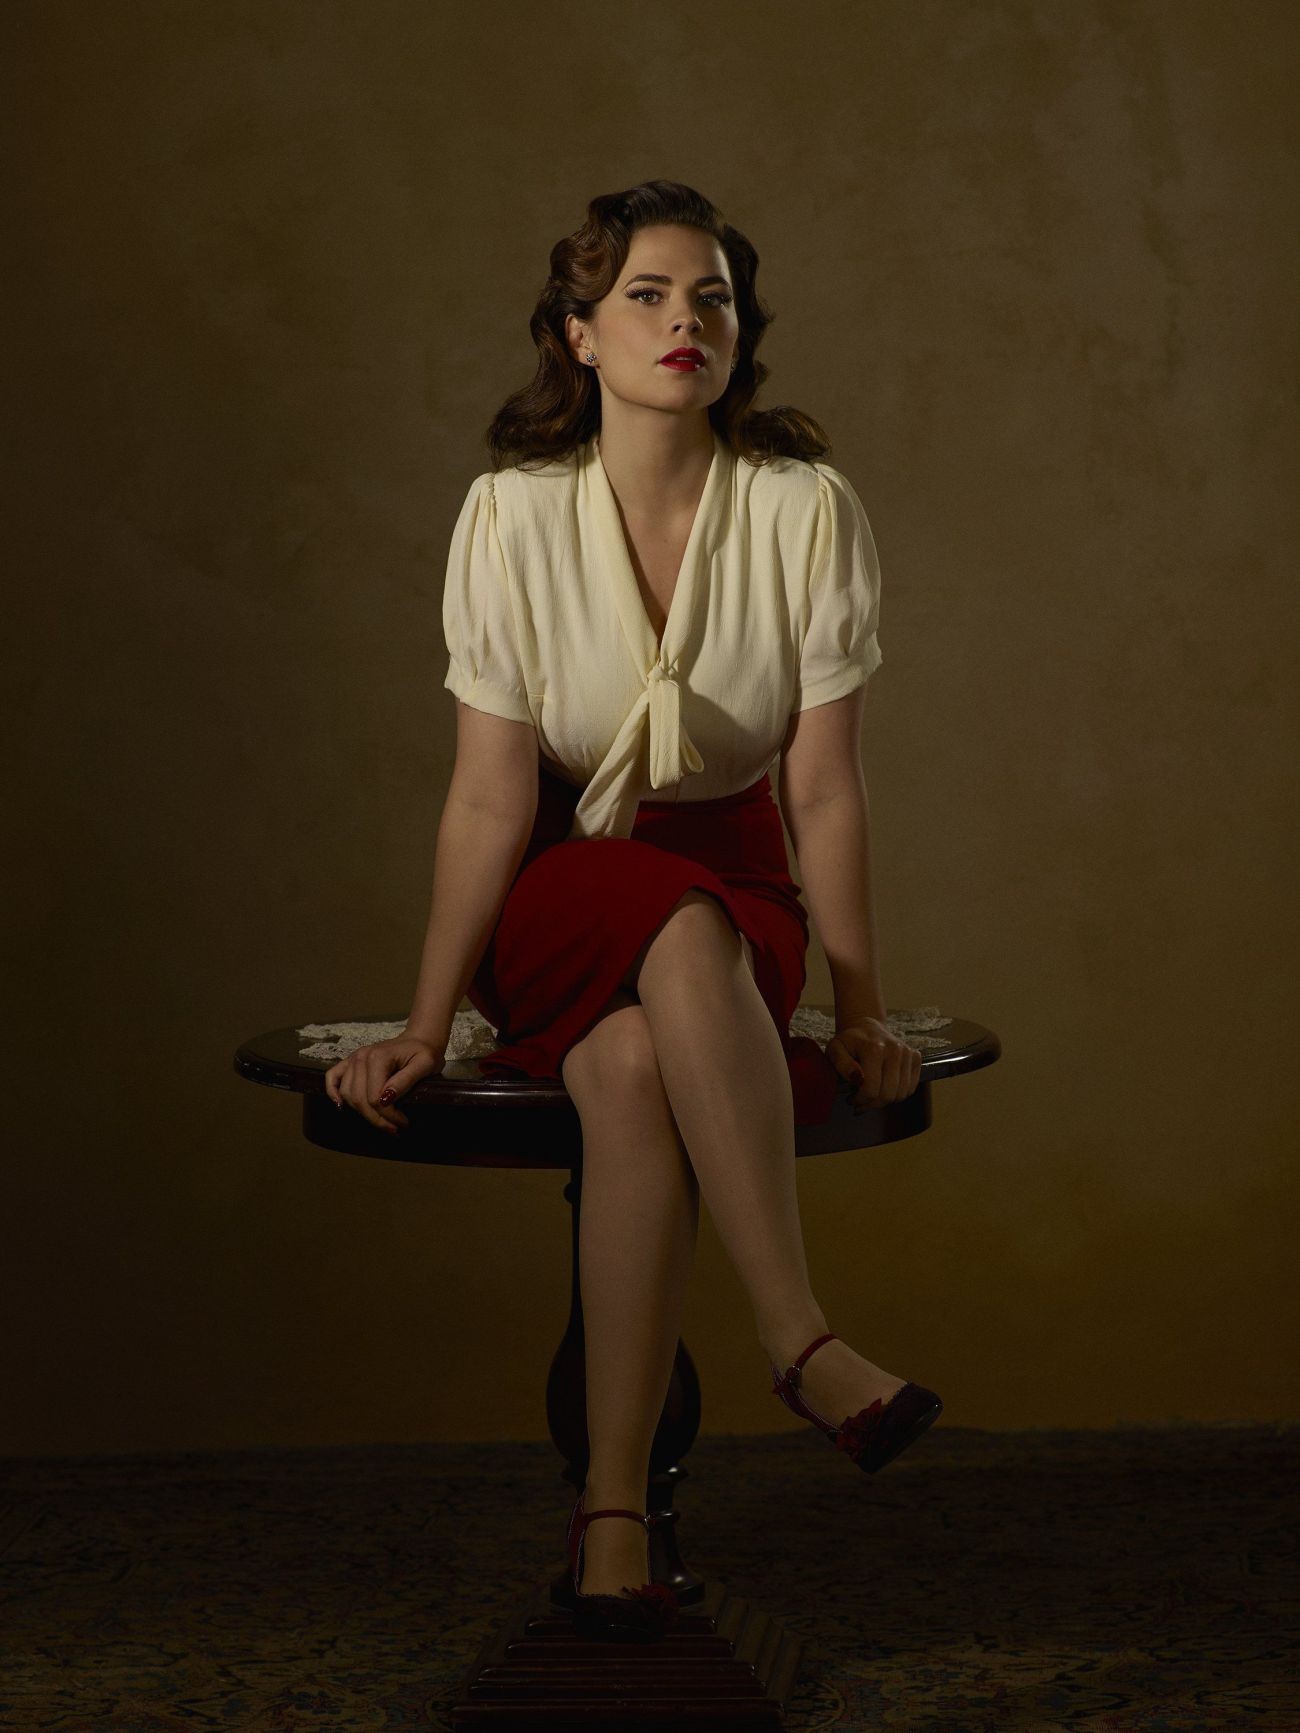 Peggy Carter (Hayley Atwell) en la serie Agent Carter (2015-2016). Imagen: pinterest.com